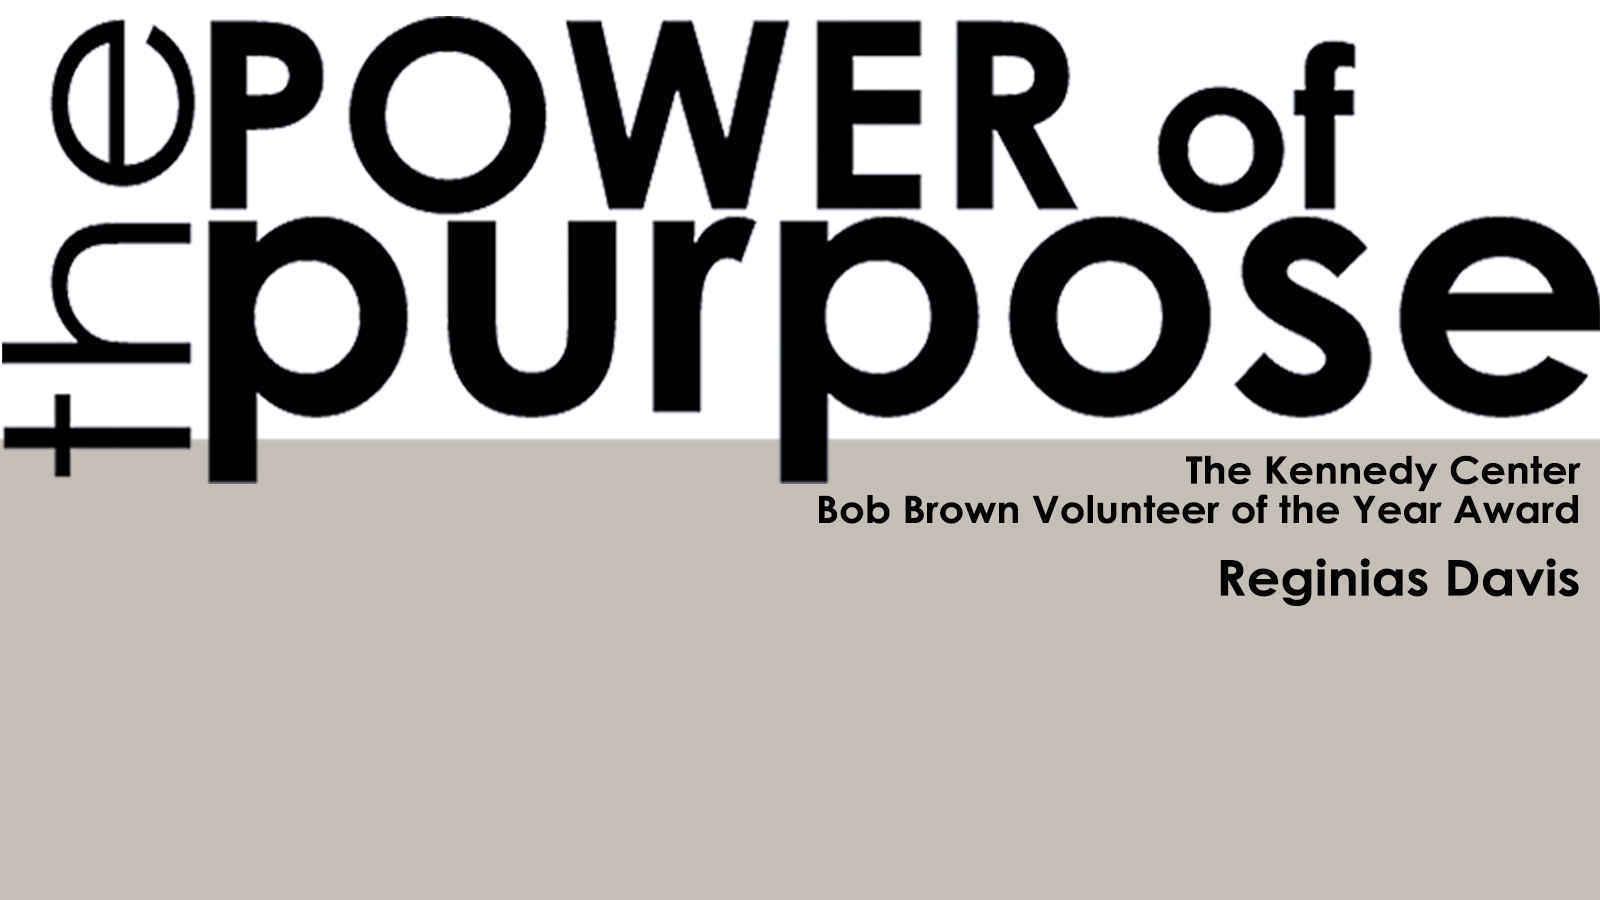 Make a gift to Honor and Congratulate Reginias Davis, Bob Brown Volunteer of the Year Award winner image